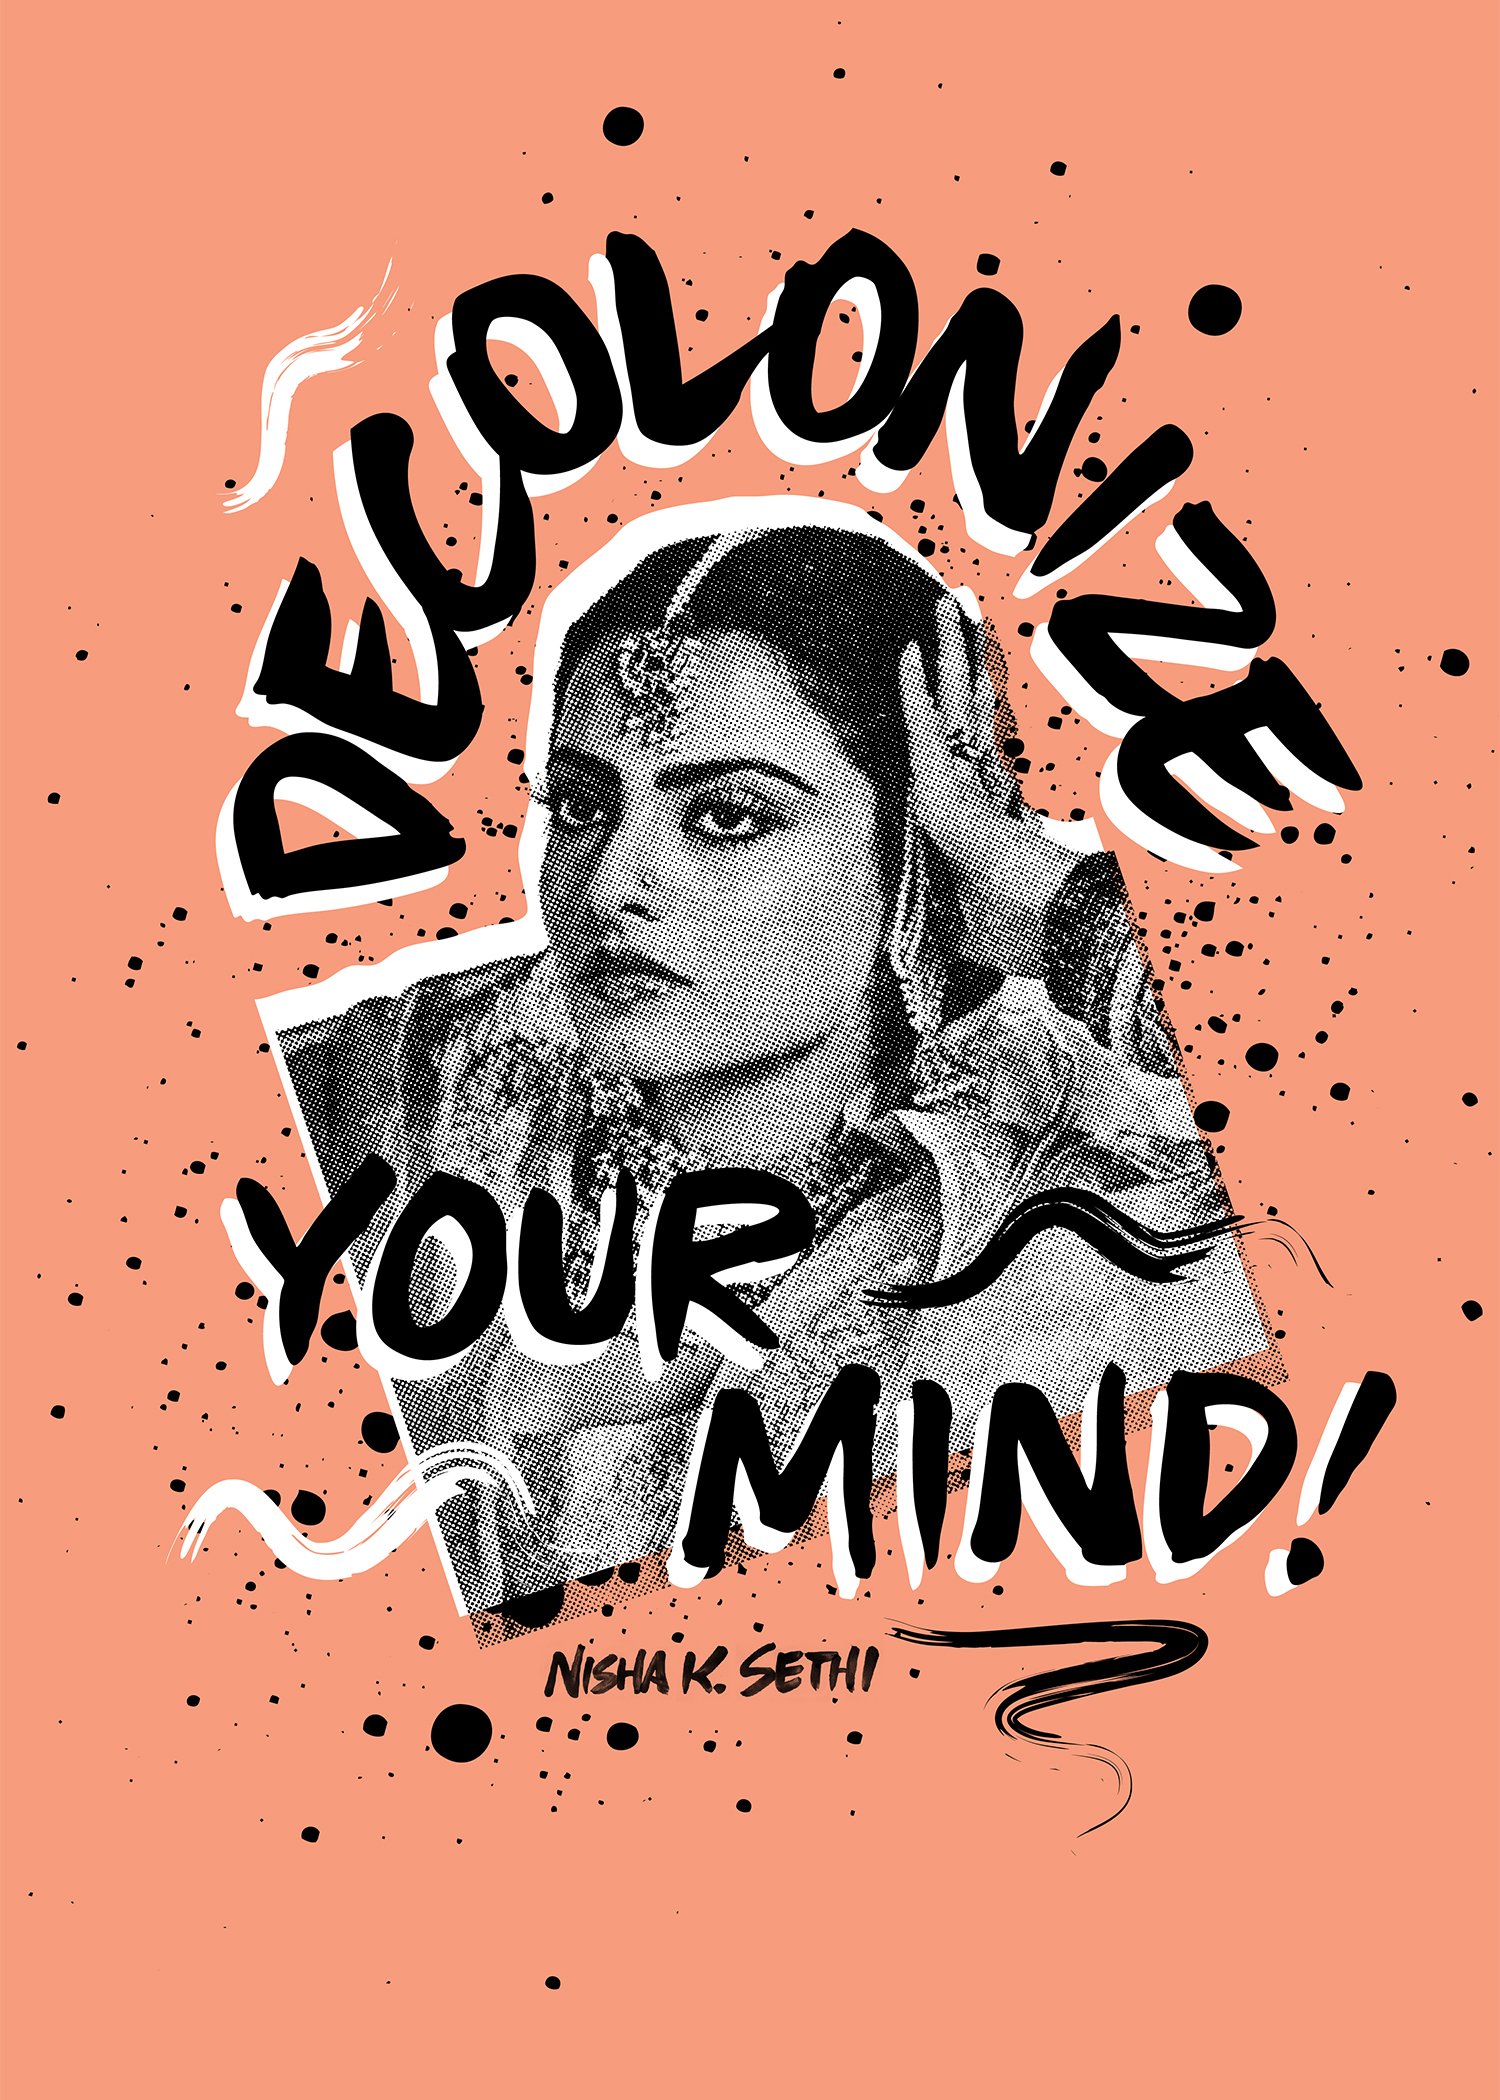 Decolonize_Your_Mind_5X7.jpg